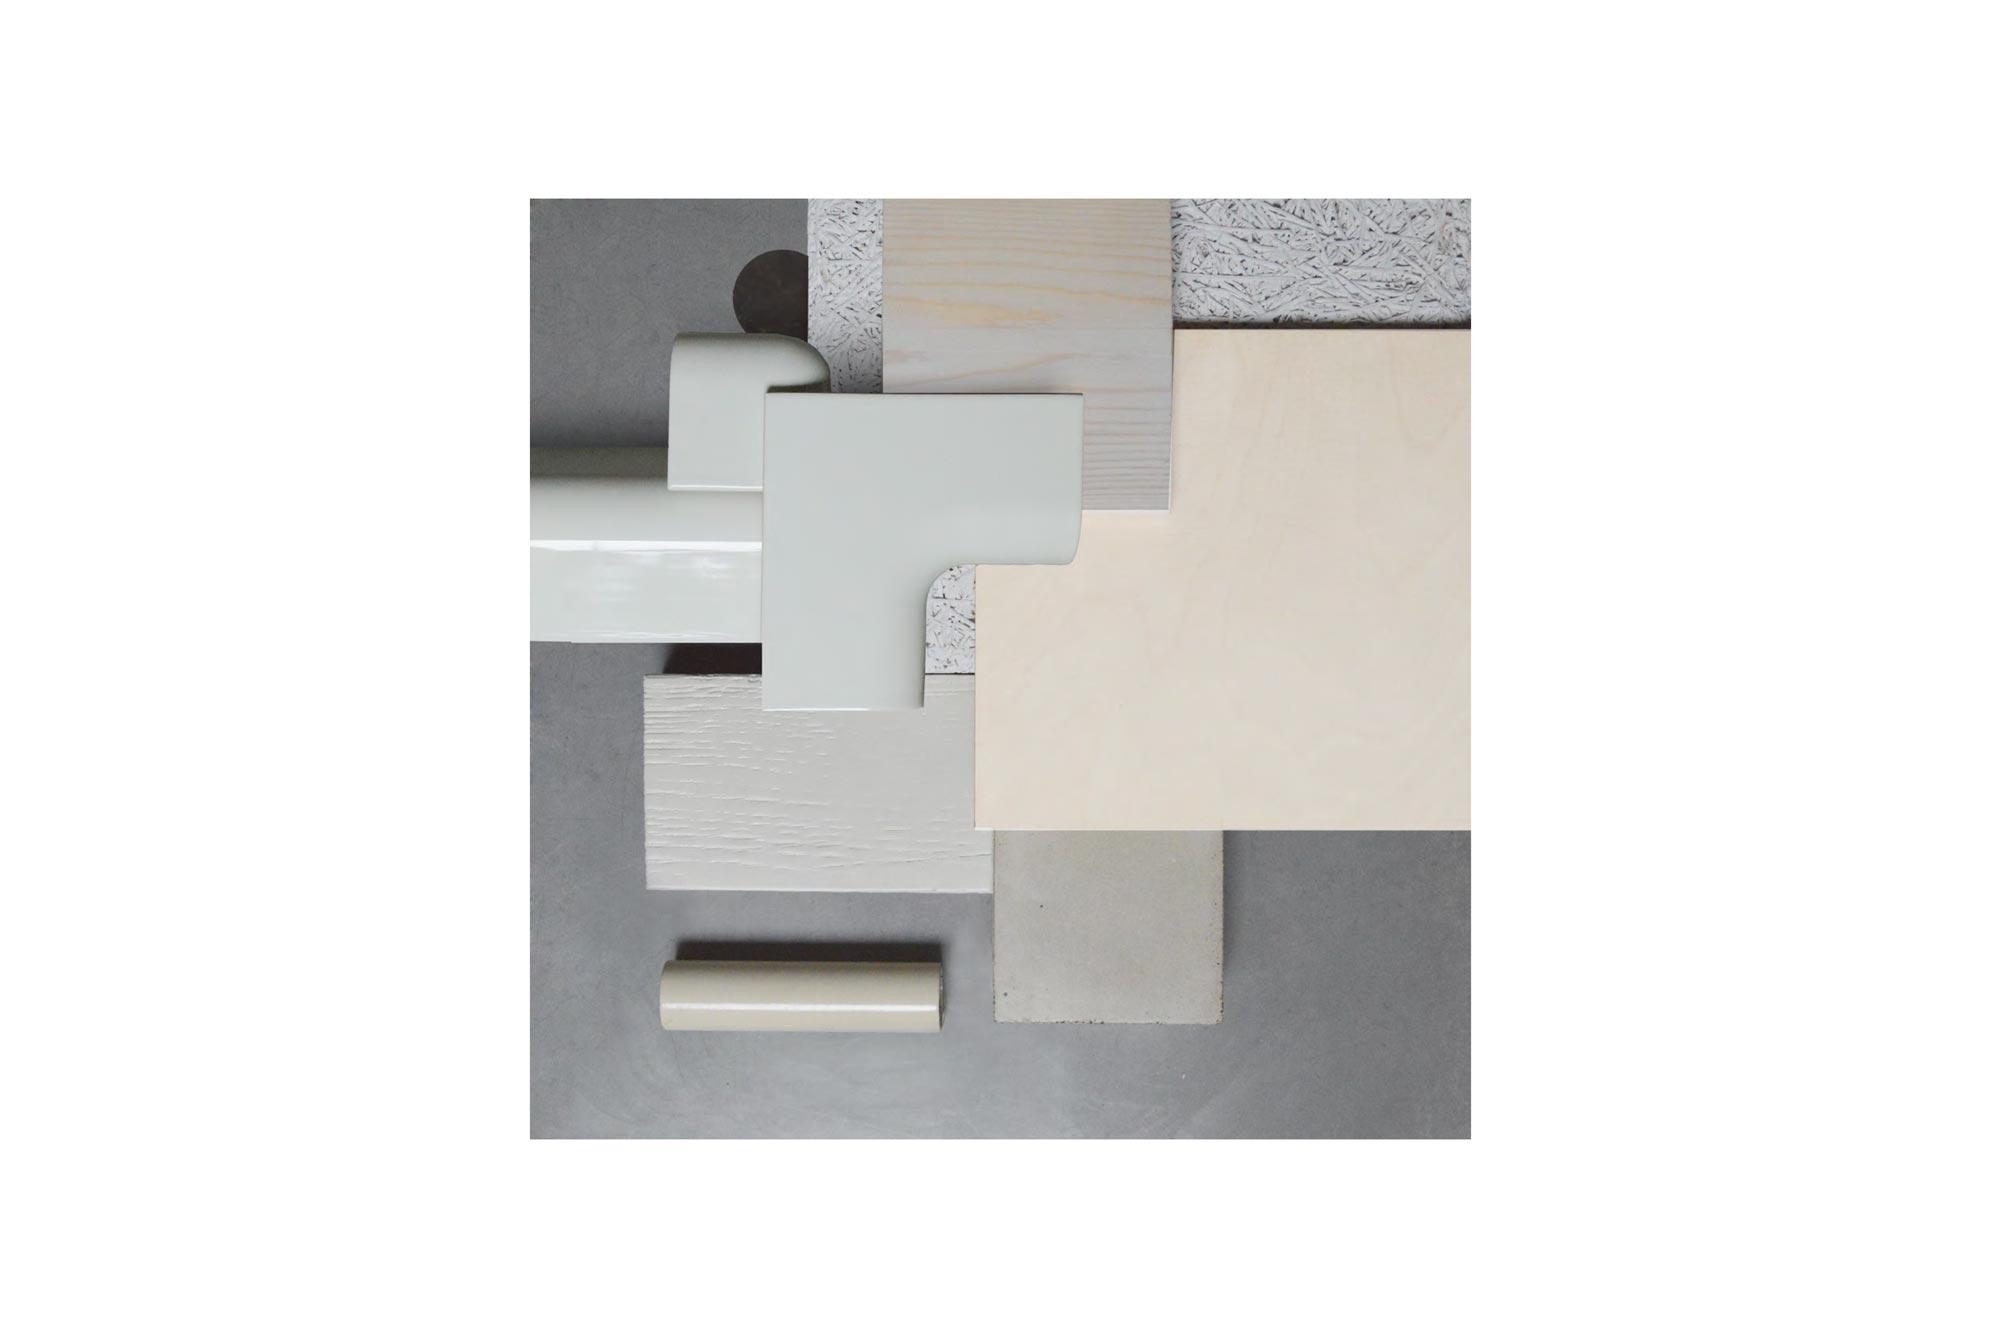 cube-haus-faye-toogood-architects-cs-2000px-13